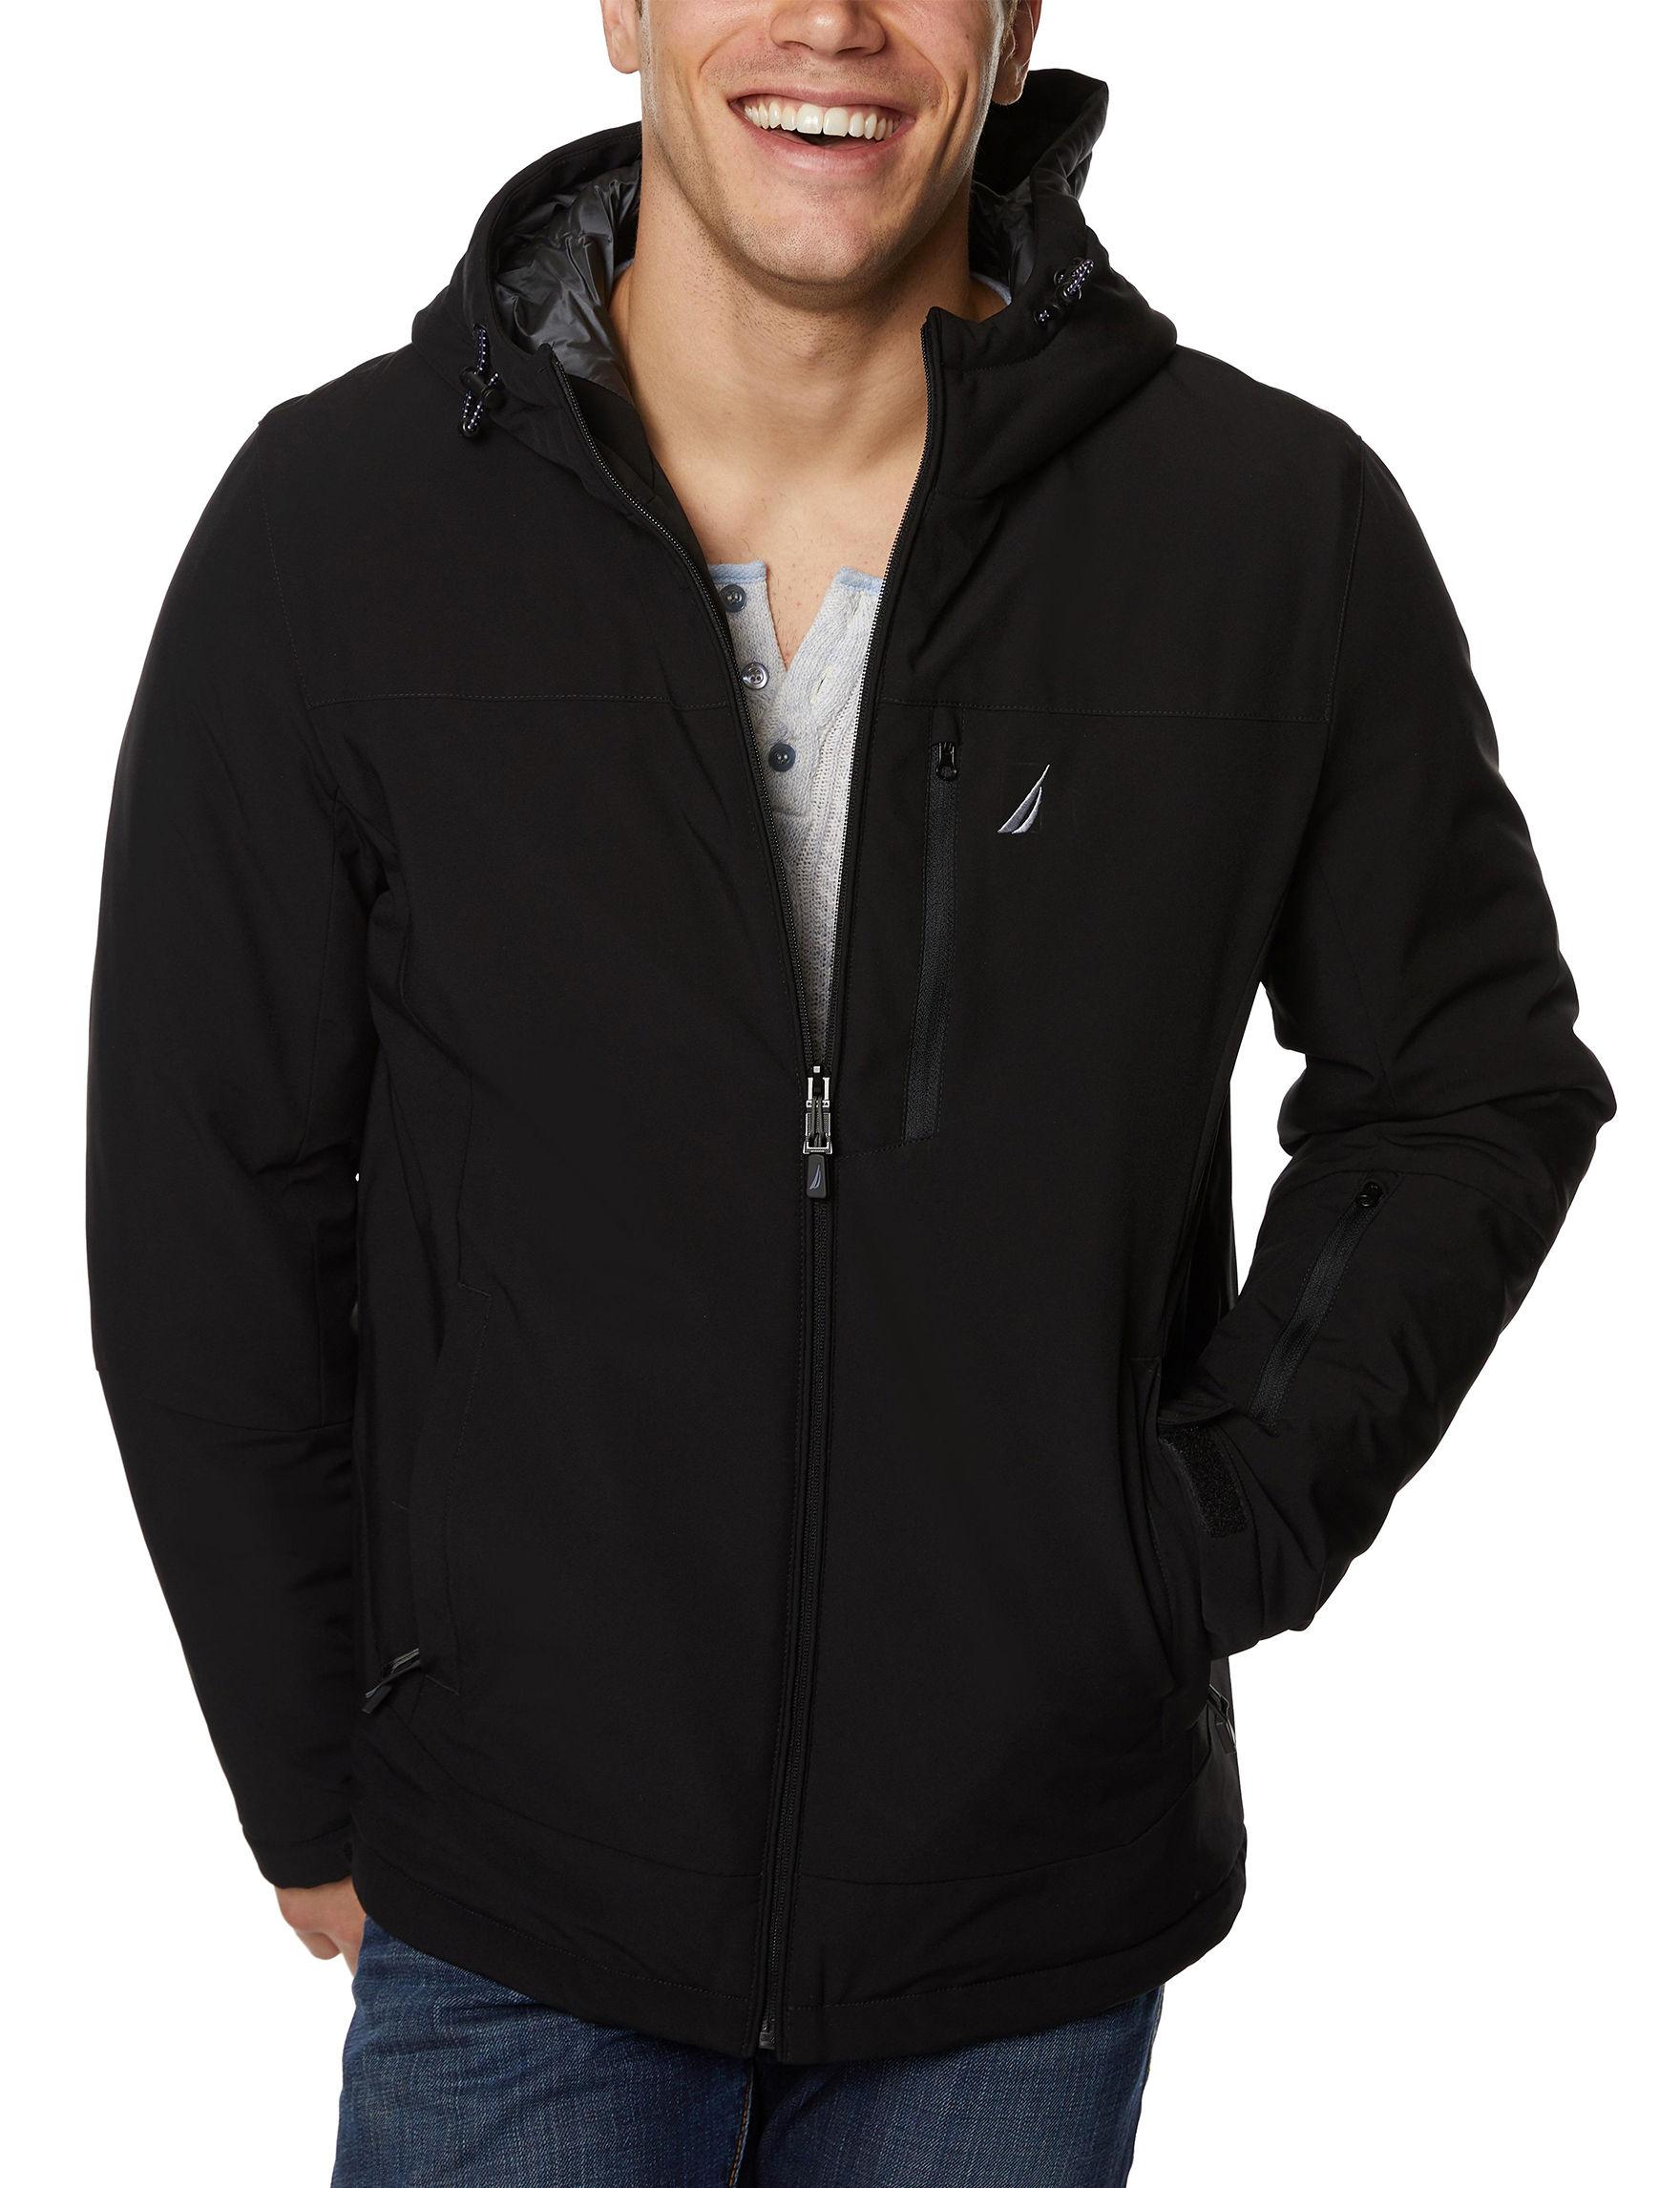 Nautica Black Lightweight Jackets & Blazers